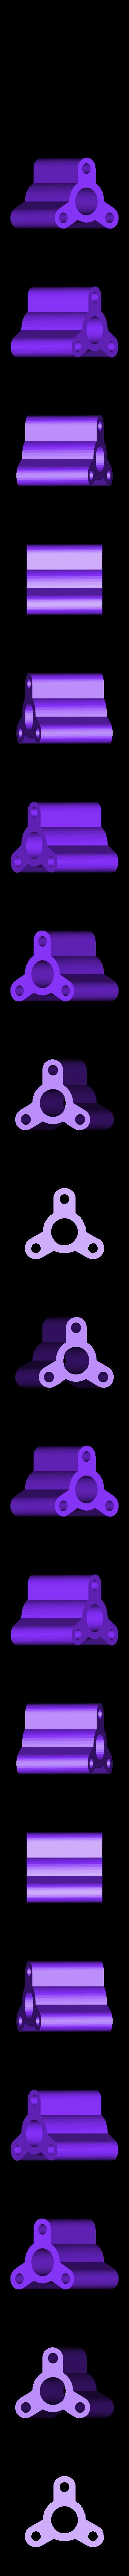 D52.5mm x L45mm Spool adapter A.STL Download STL file Spool Holder Hub Adapters • Template to 3D print, PlanetBlue